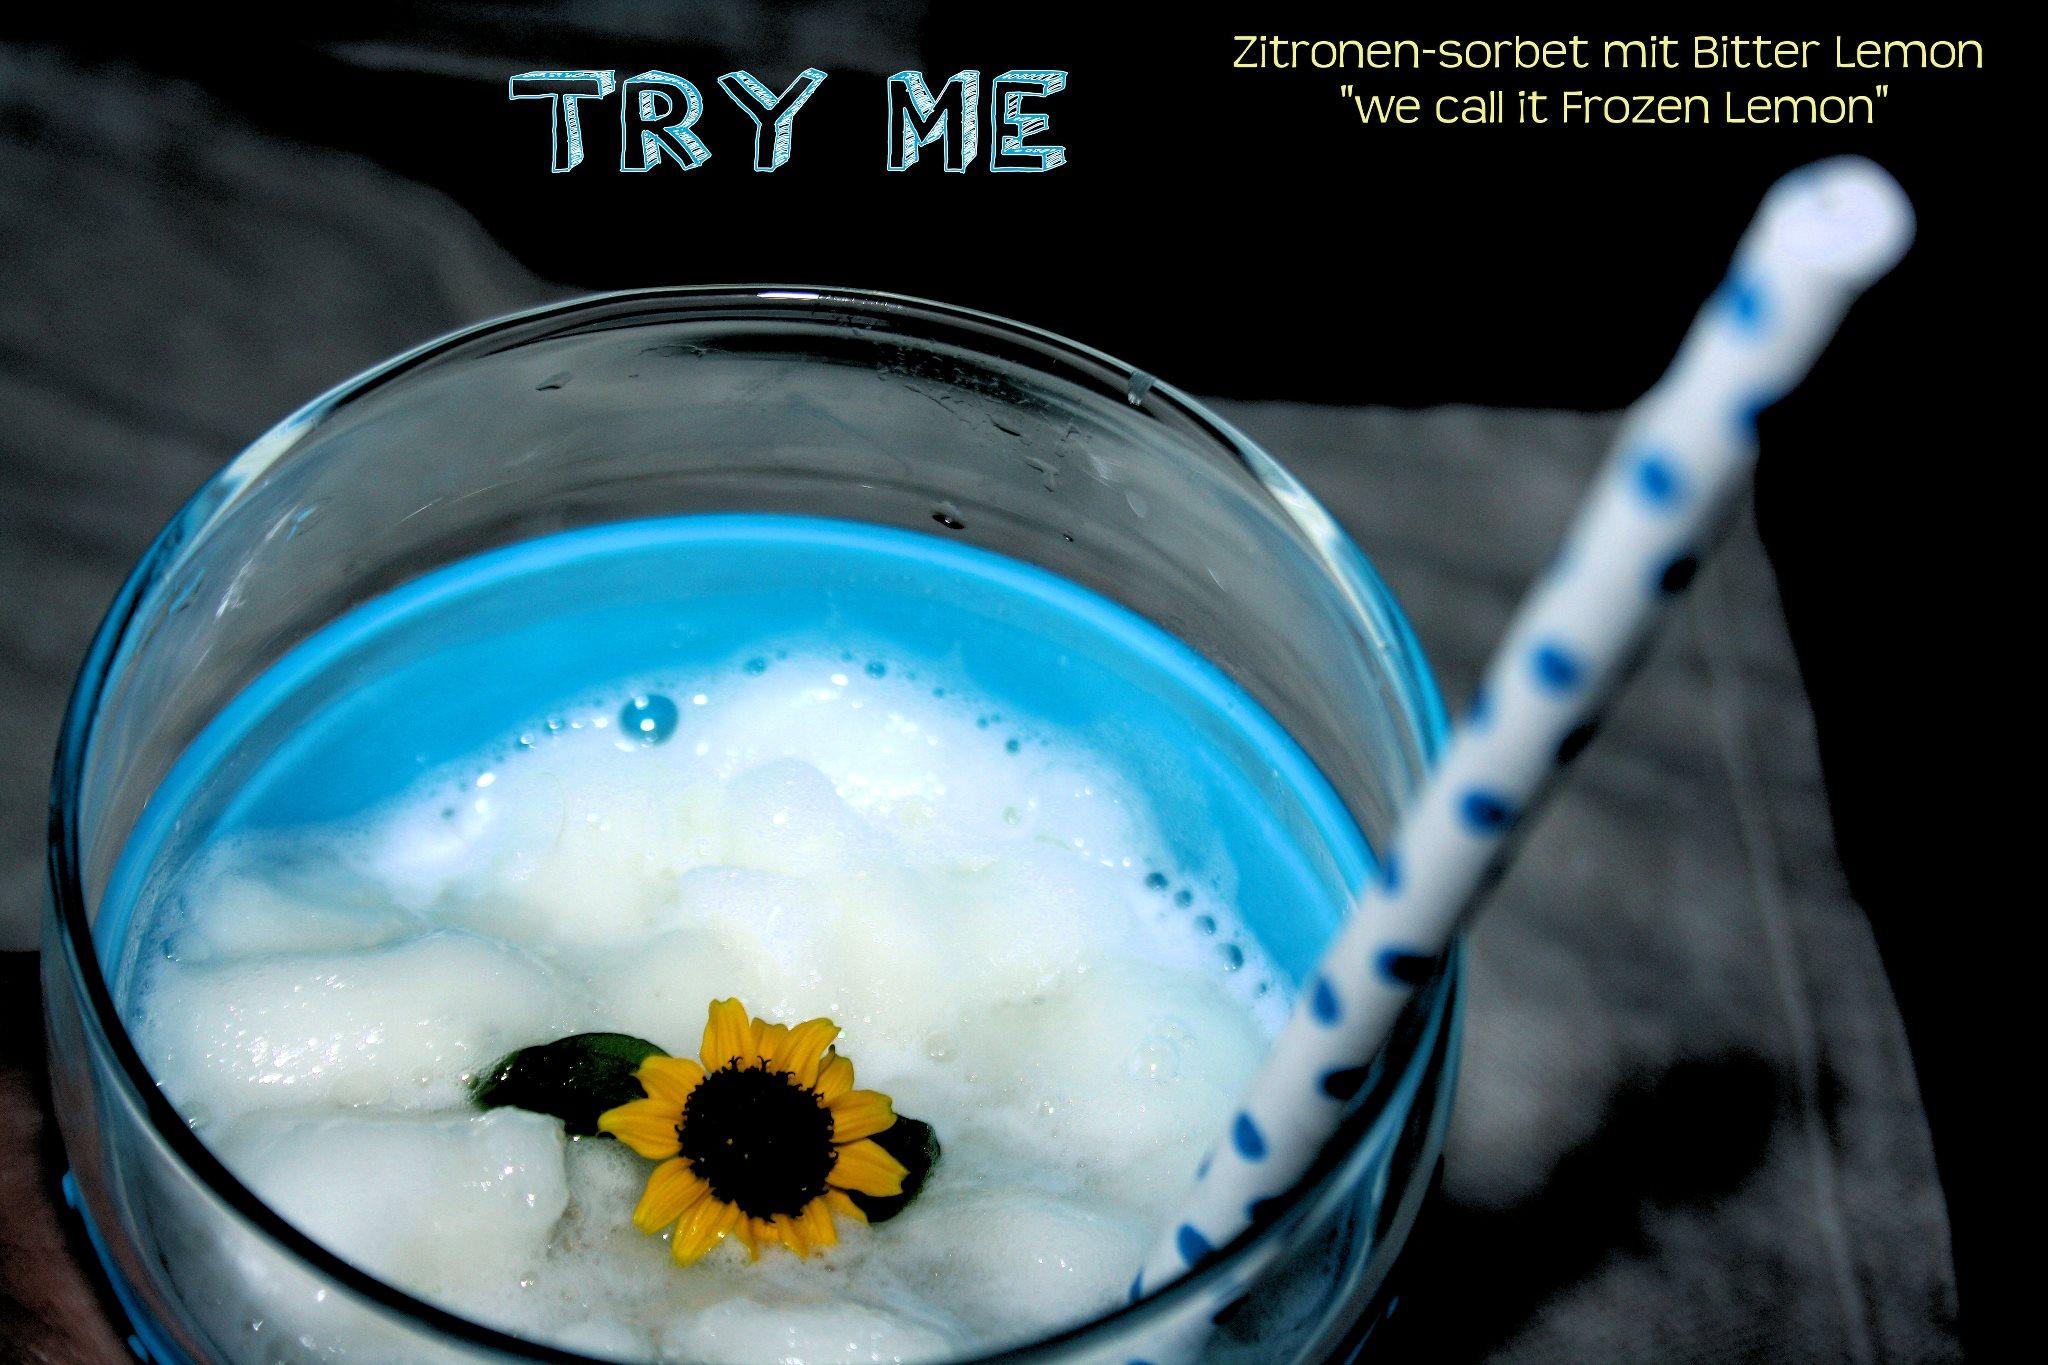 Frozen Lemon